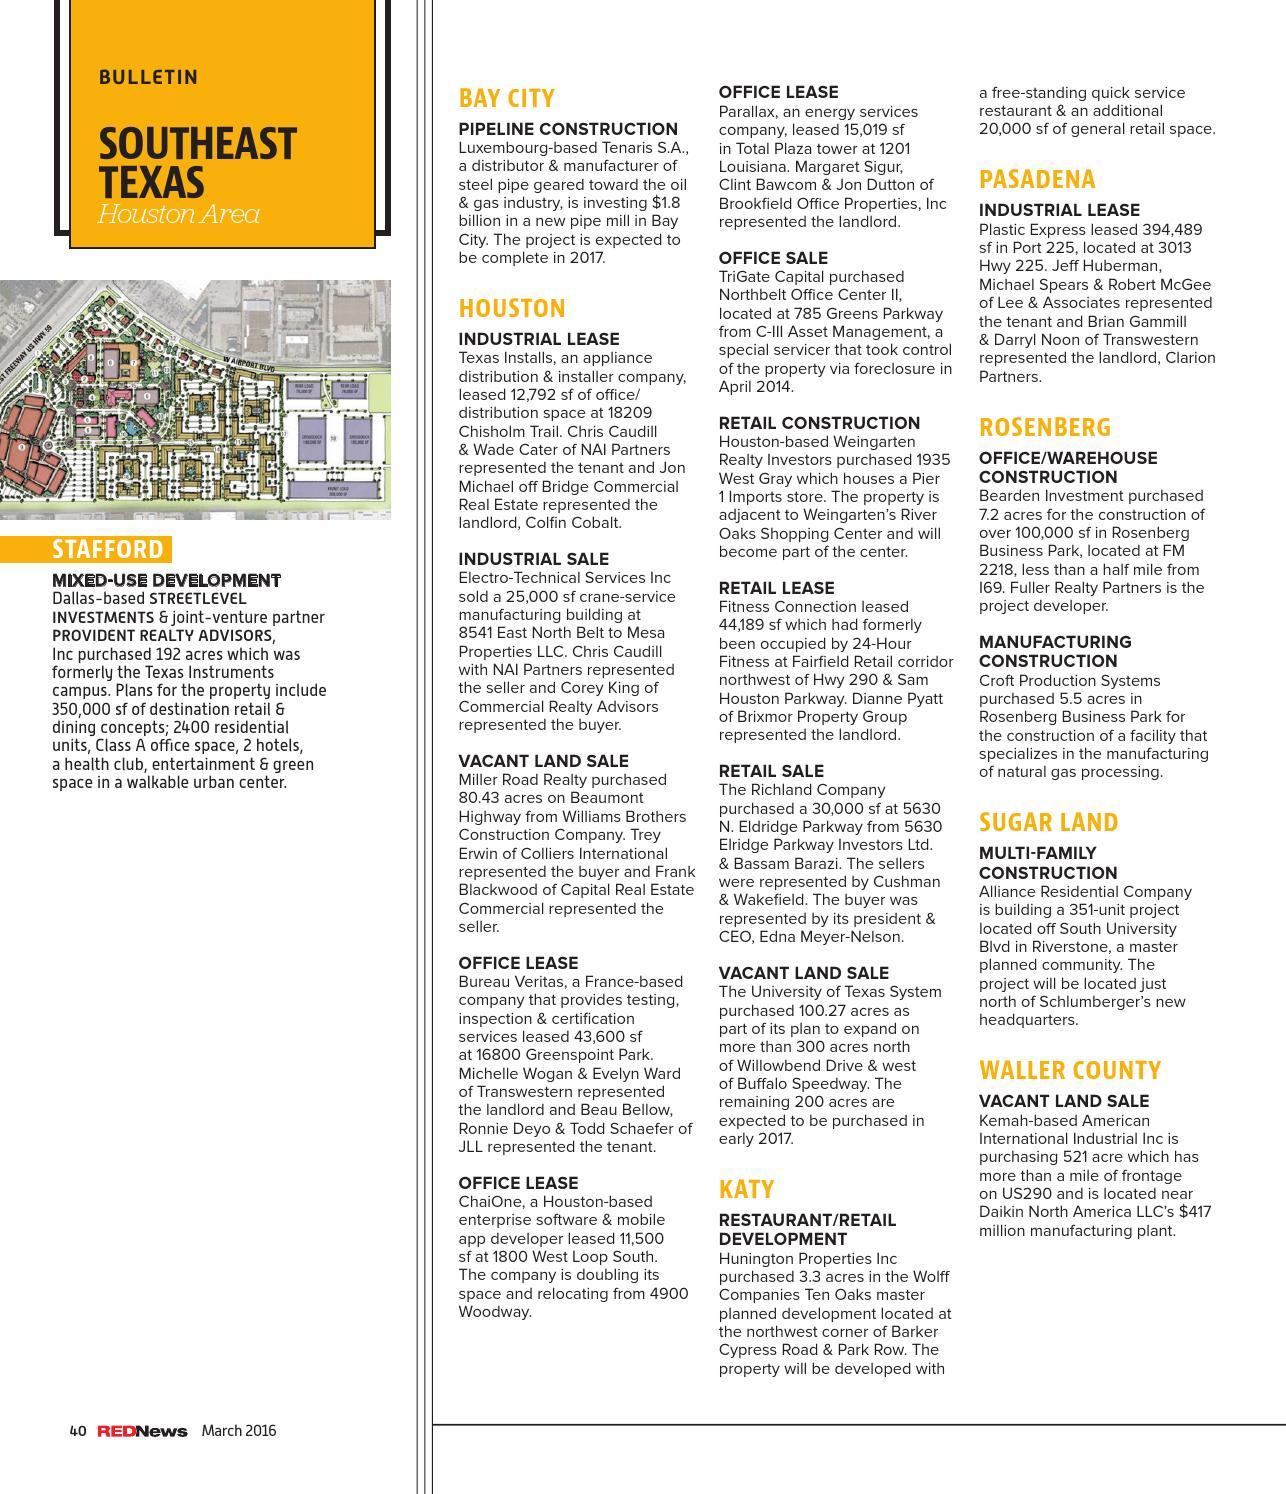 REDNews March 2016 - North Texas by REDNews - issuu